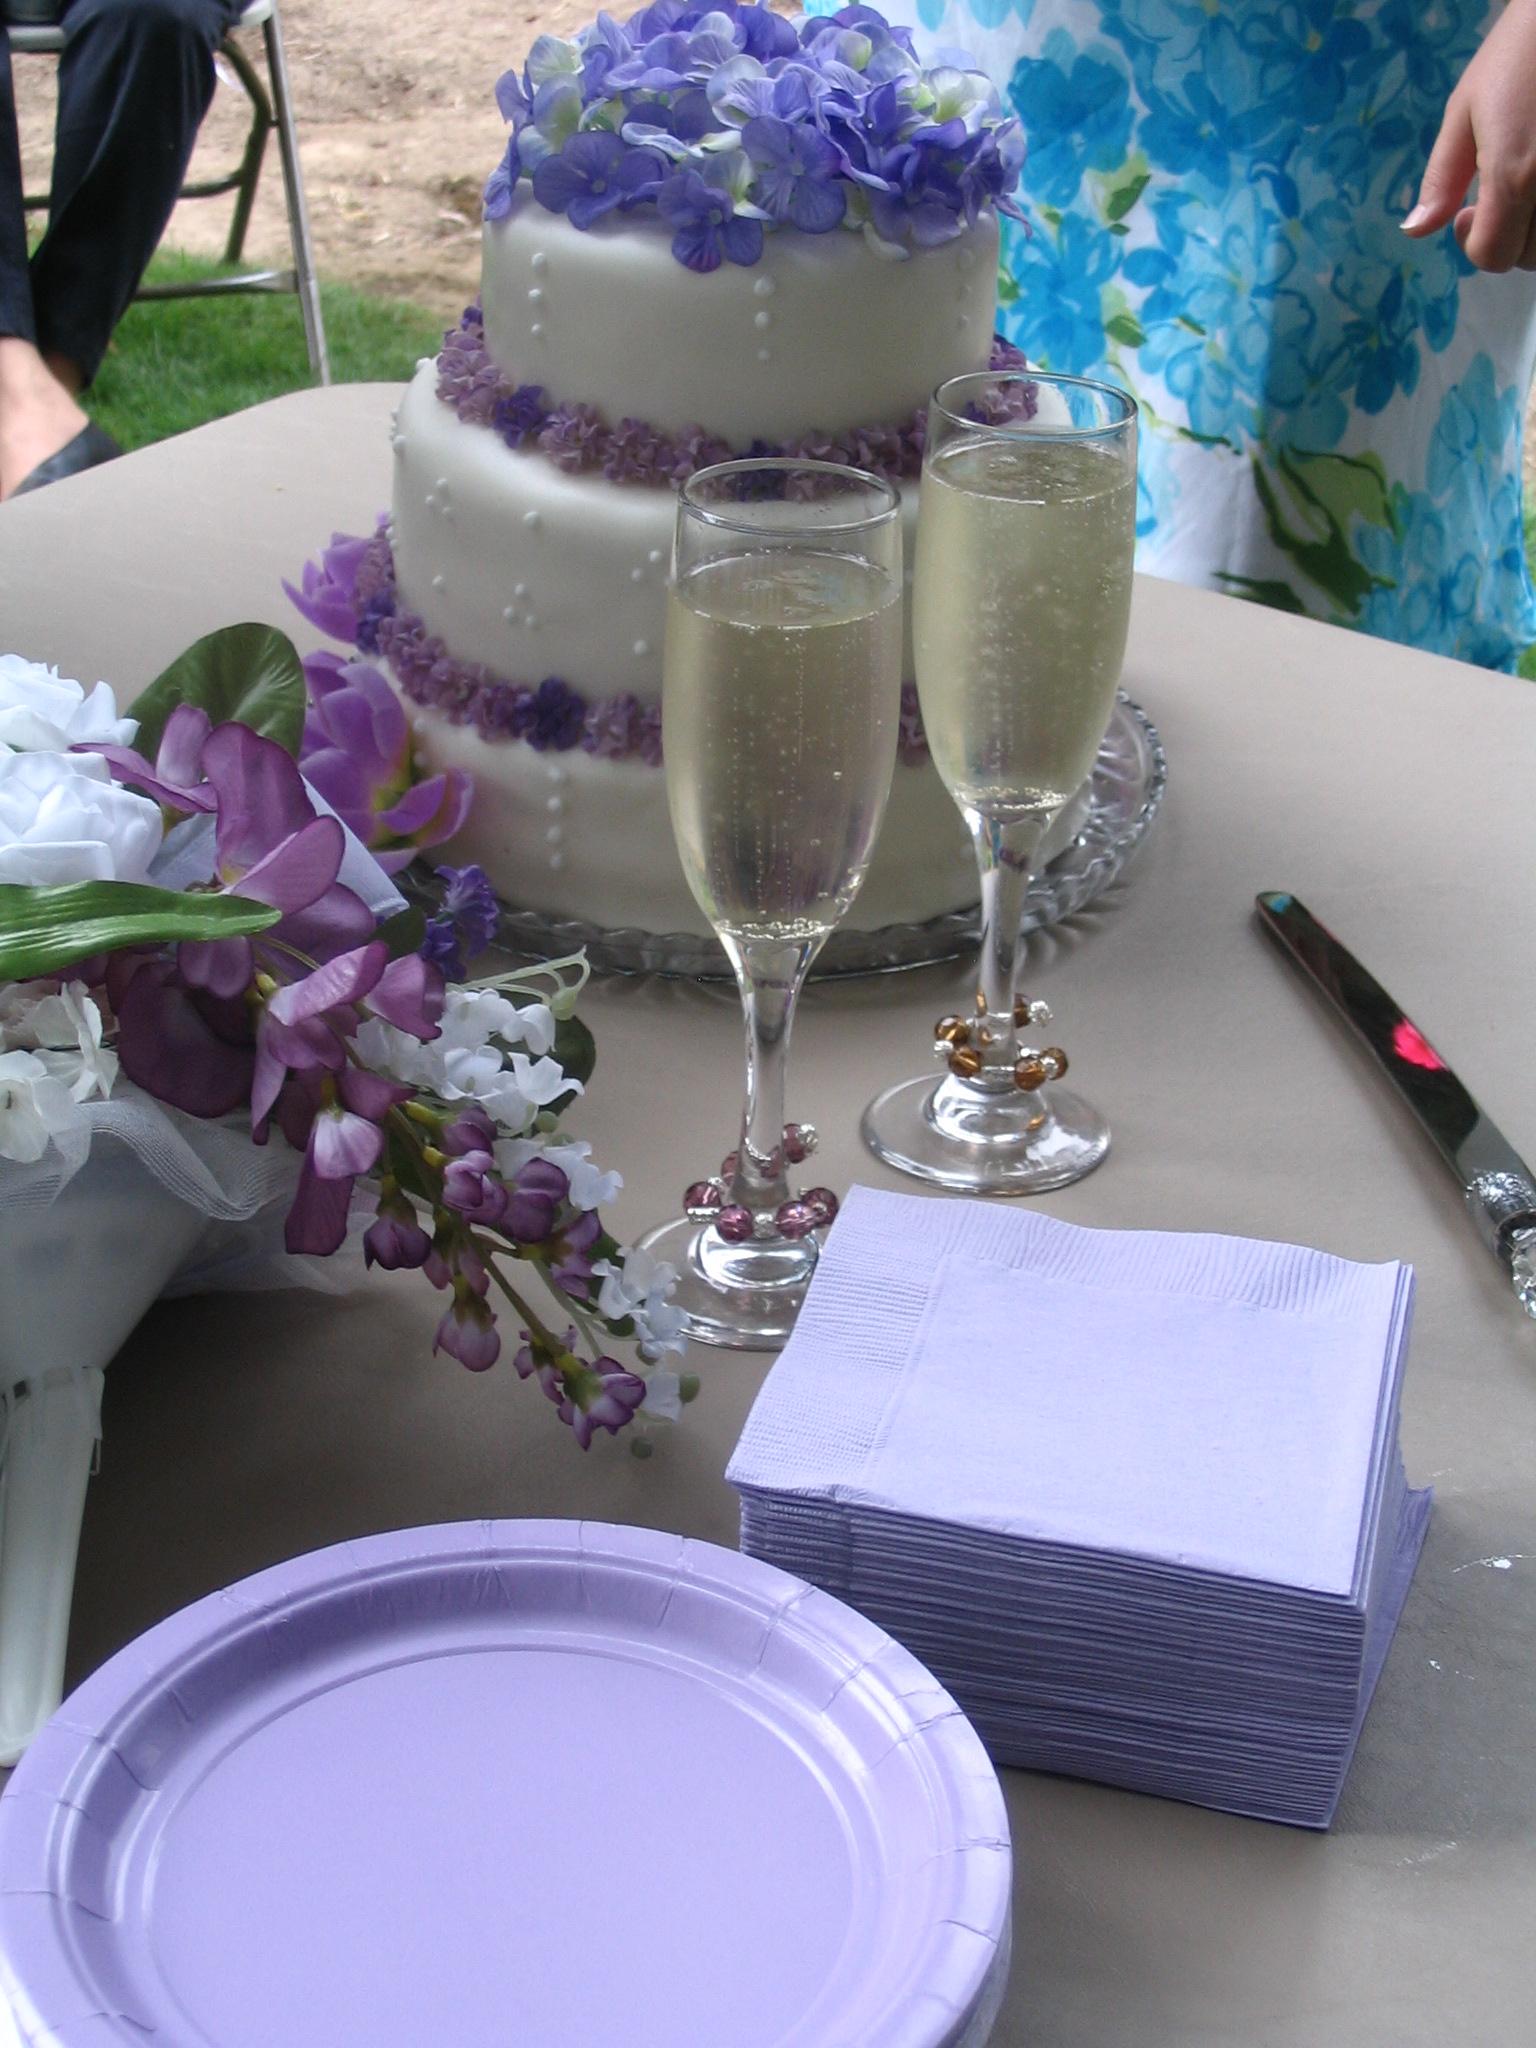 (c)2009 Em at https://diabetesdietdialogue.wordpress.com Diabetic Wedding Advice 2022